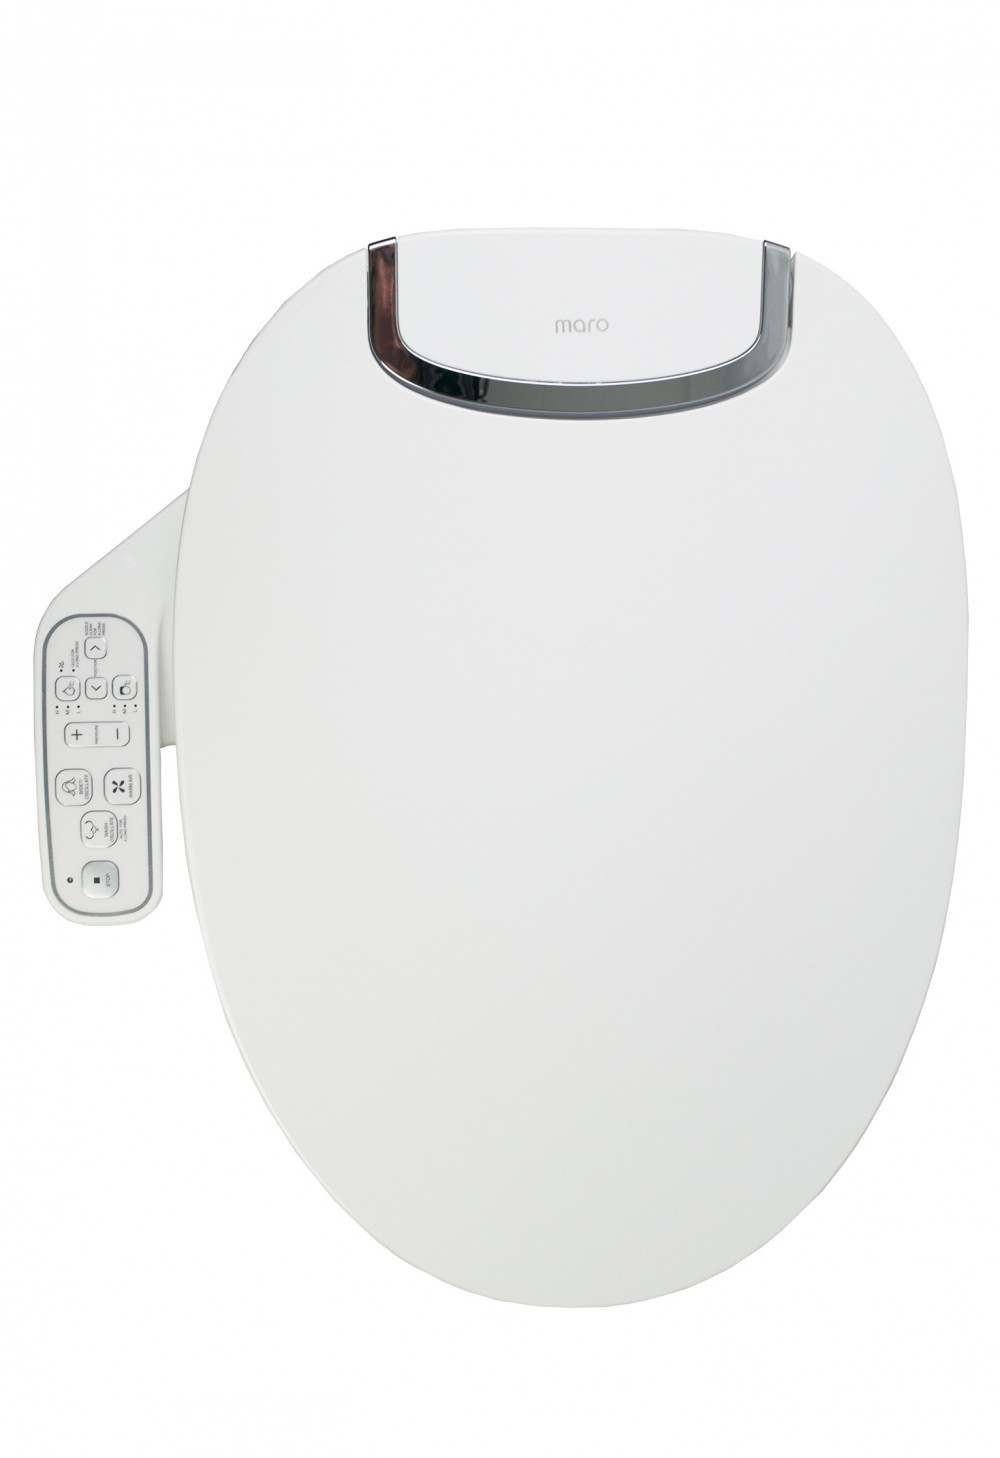 Maro d'italia Di800 aquaclean dusch wc